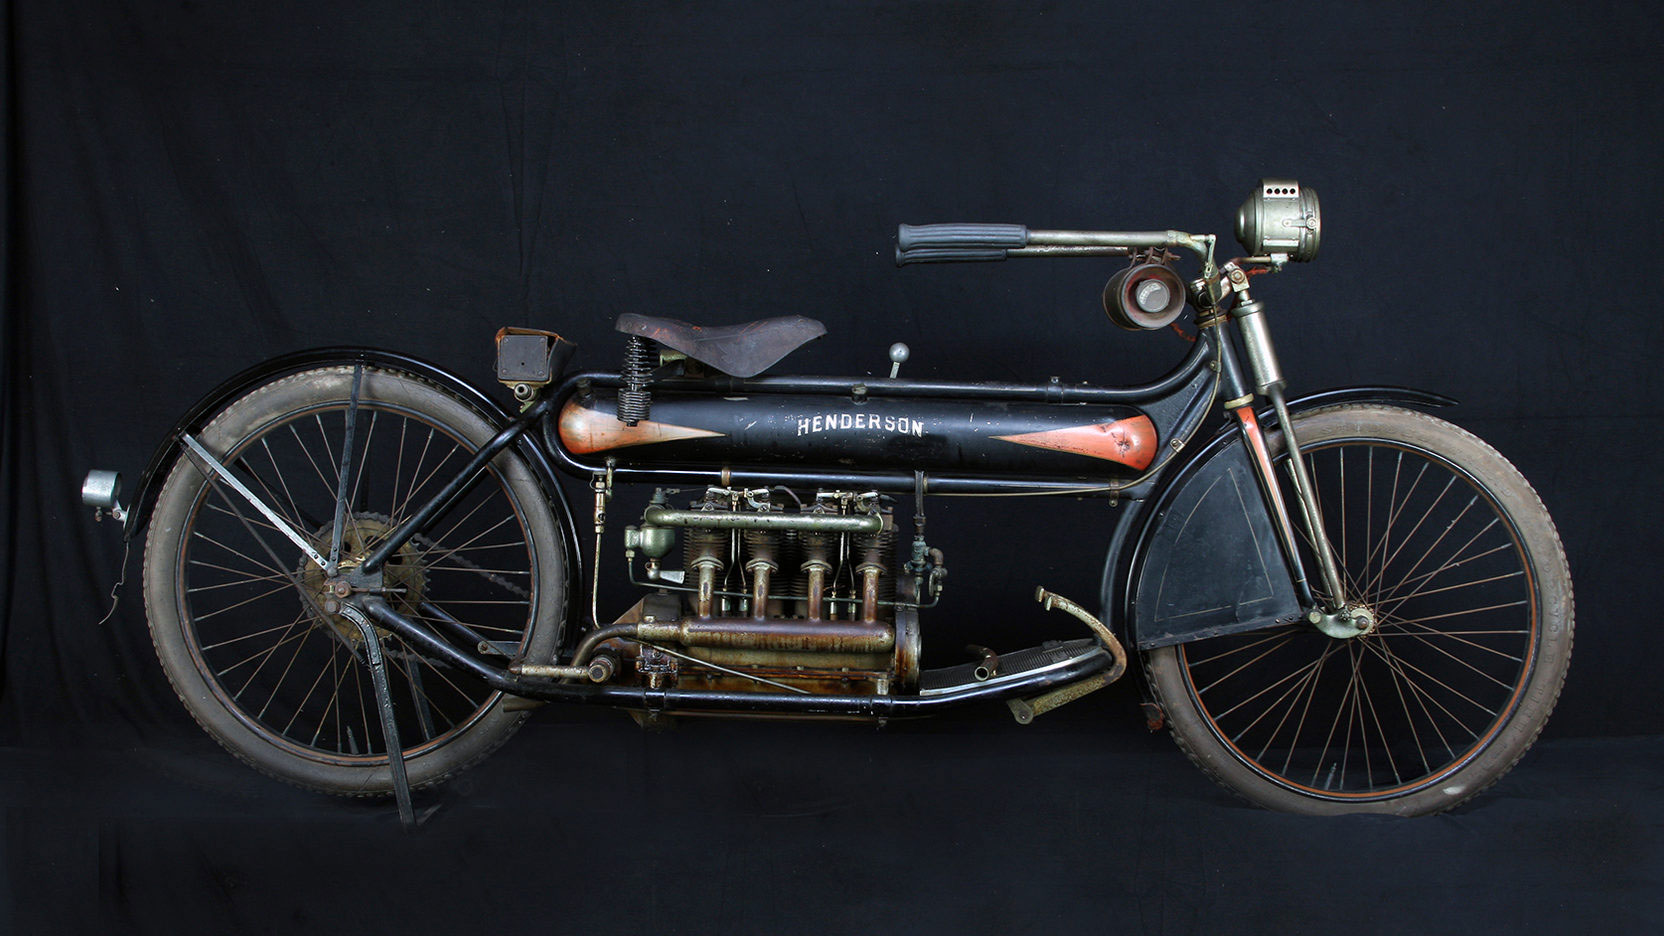 1912 Henderson Four